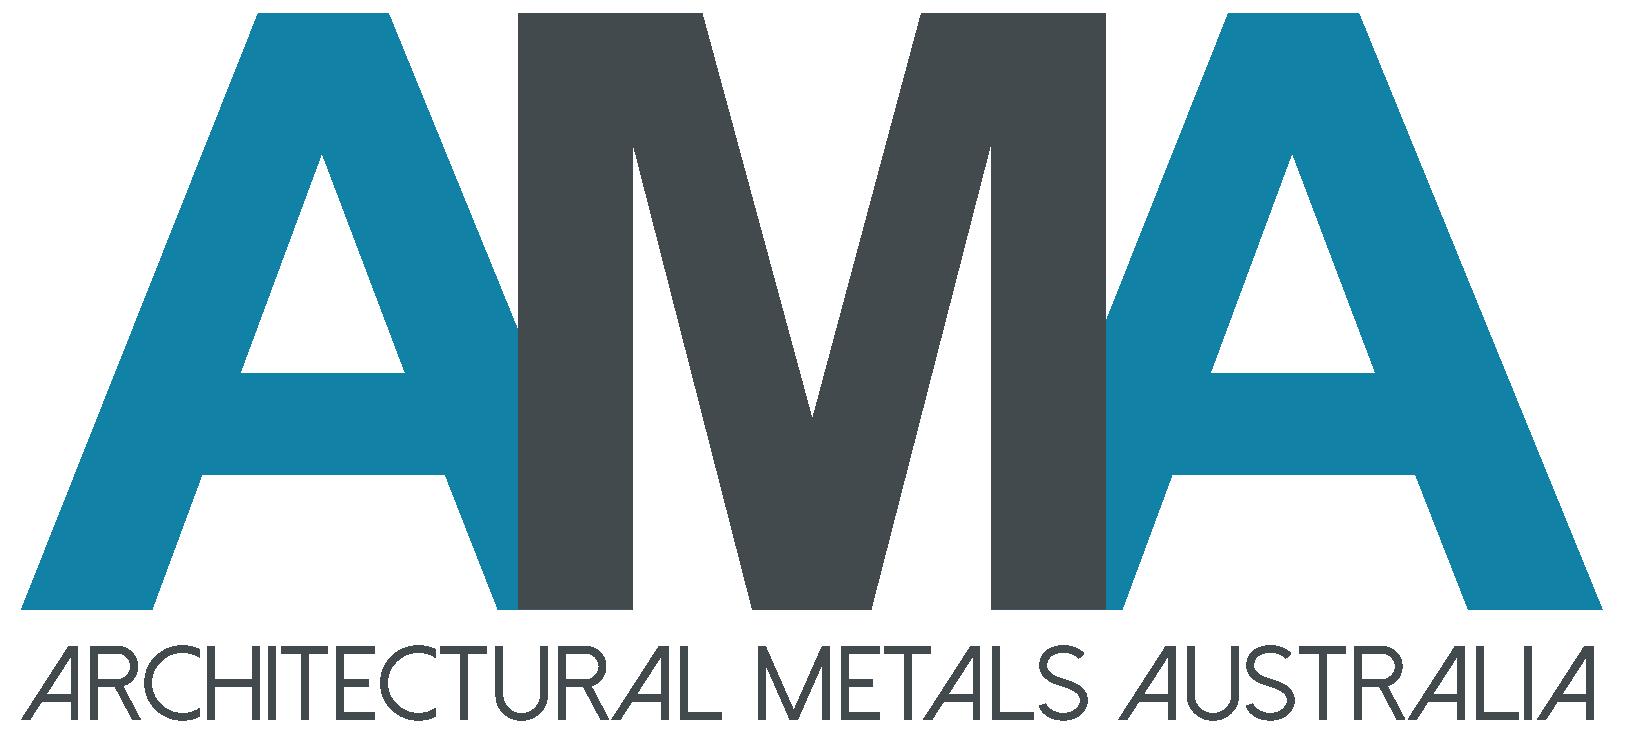 Architectural Metals Australia